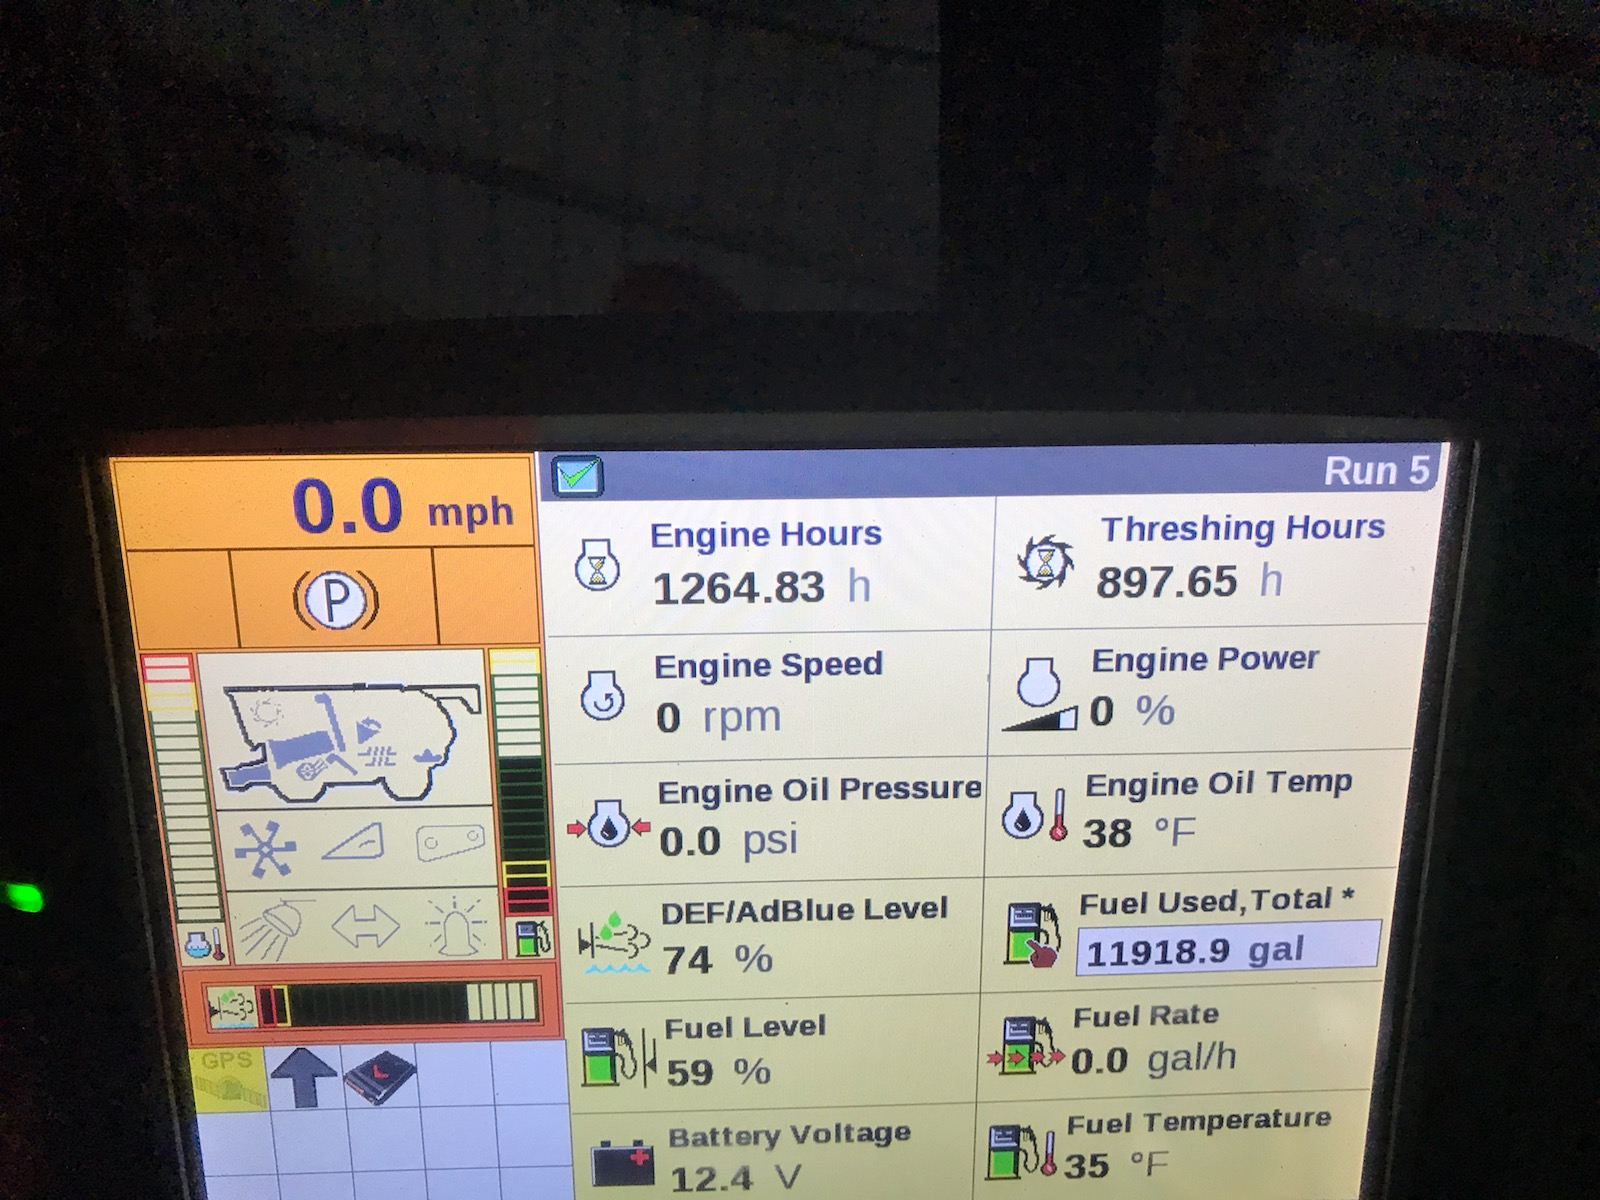 Lot 16 - 2014 Case IH 5130 AFS, PRWD, Axial Flow Combine